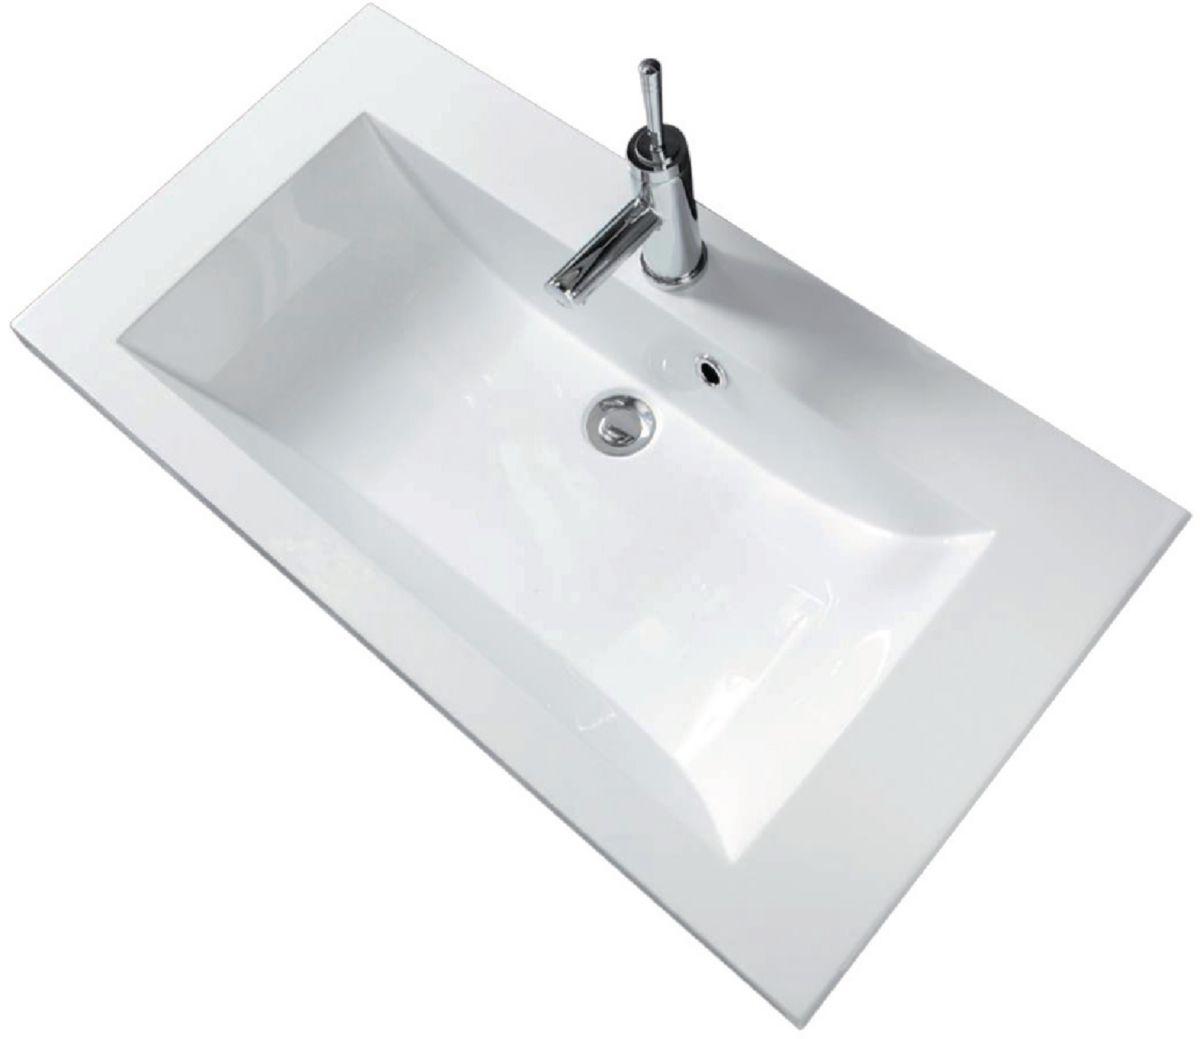 alterna plan de synth se 1 vasque seducta 90 cm blanc. Black Bedroom Furniture Sets. Home Design Ideas